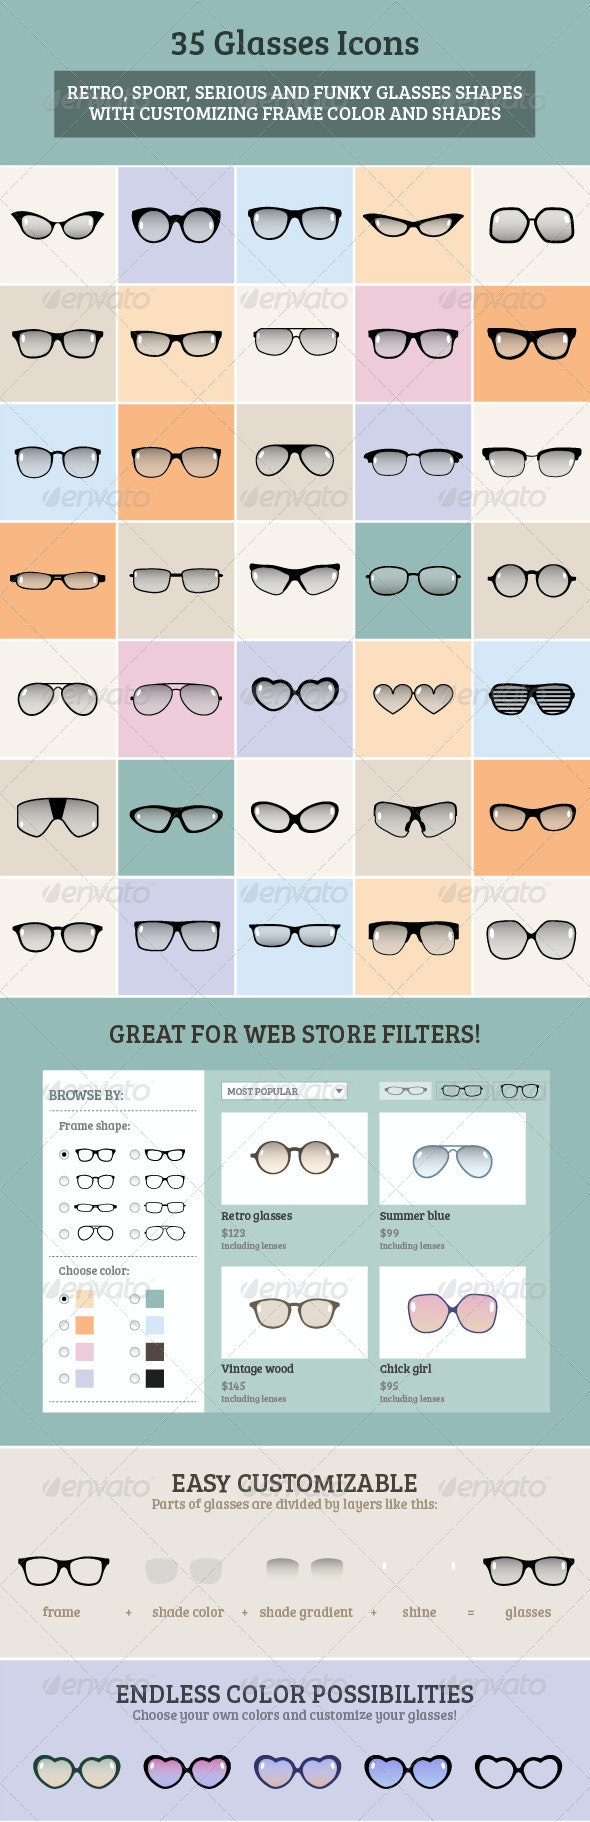 35 Glasses Icons Set - Miscellaneous Illustrations